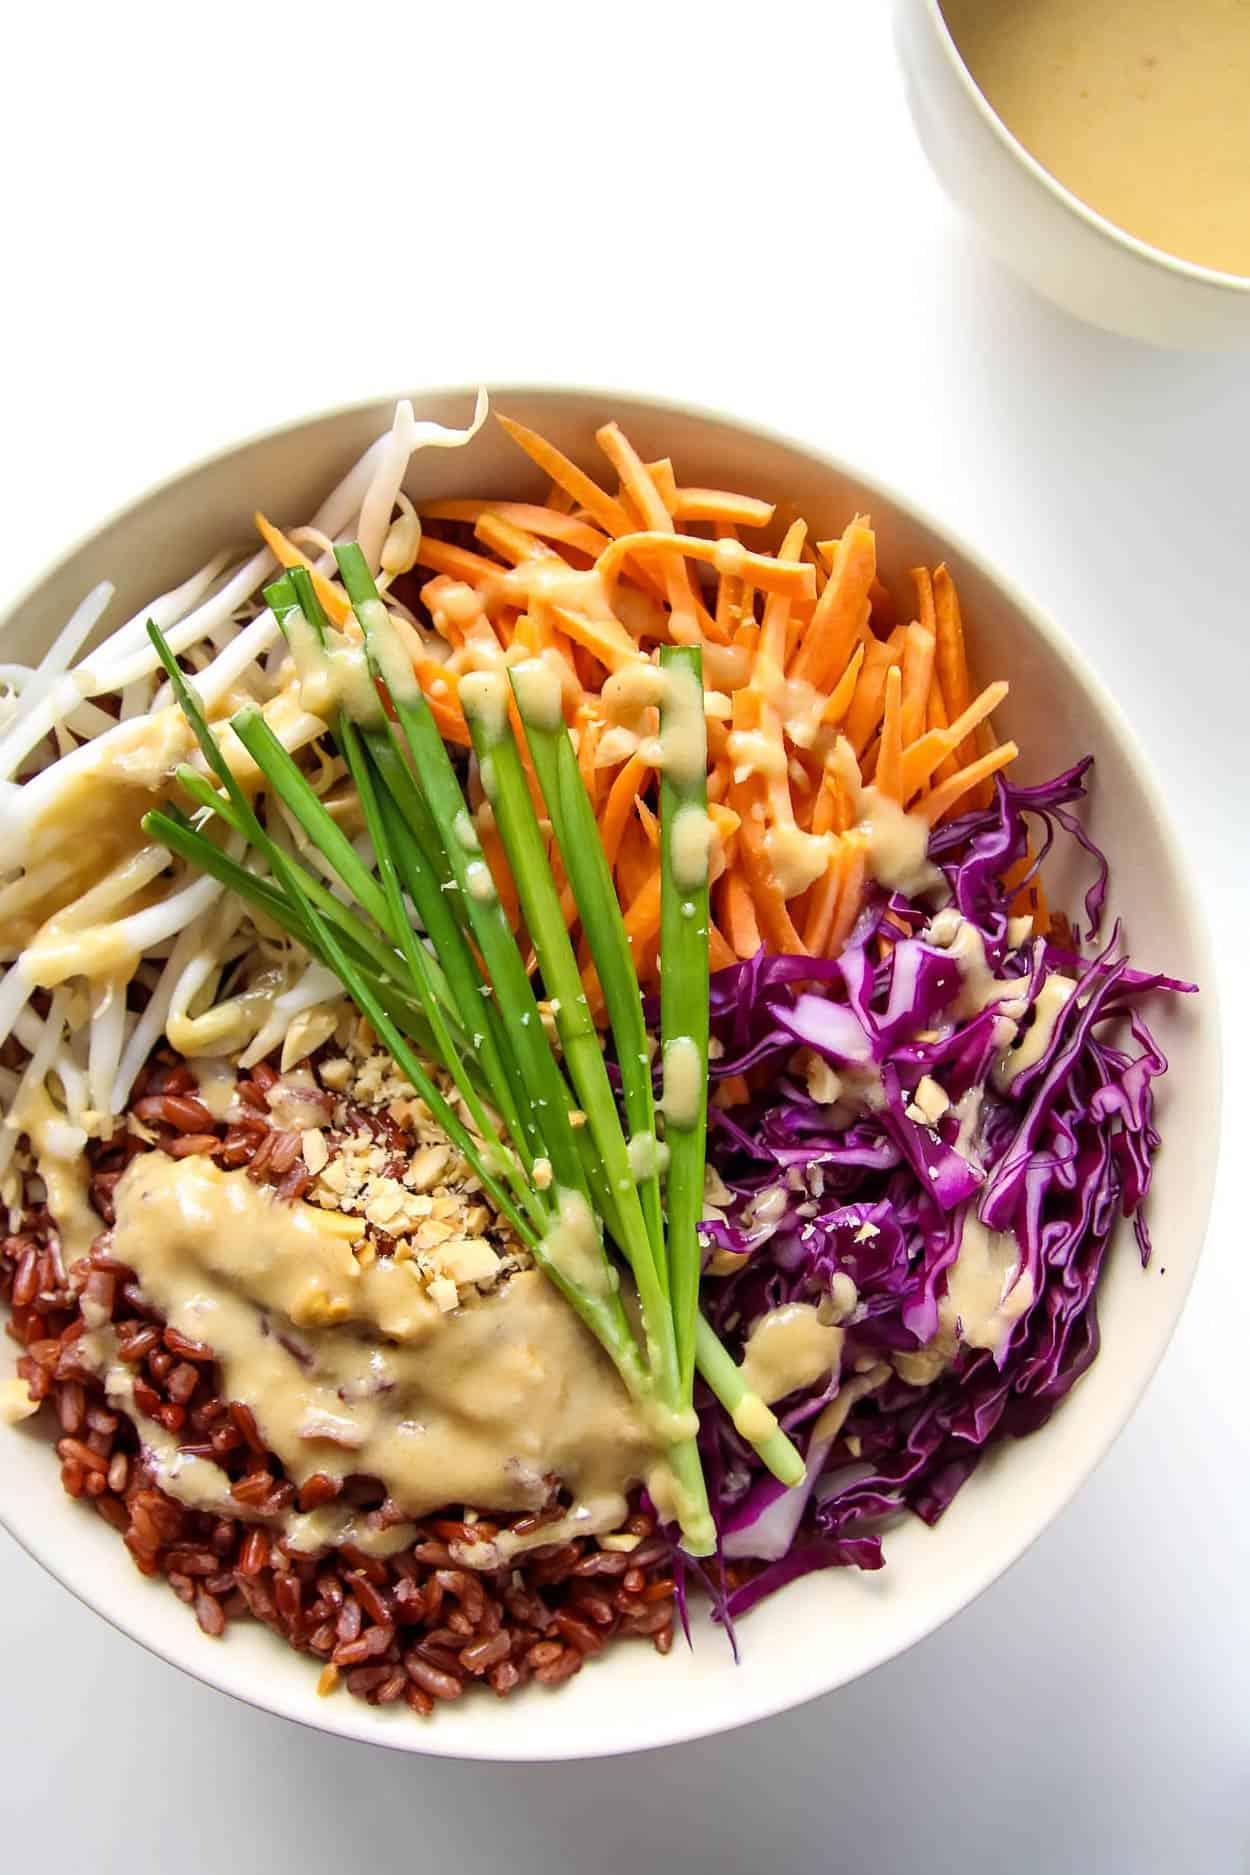 Vegetable Buddha Bowl with Peanut Sauce